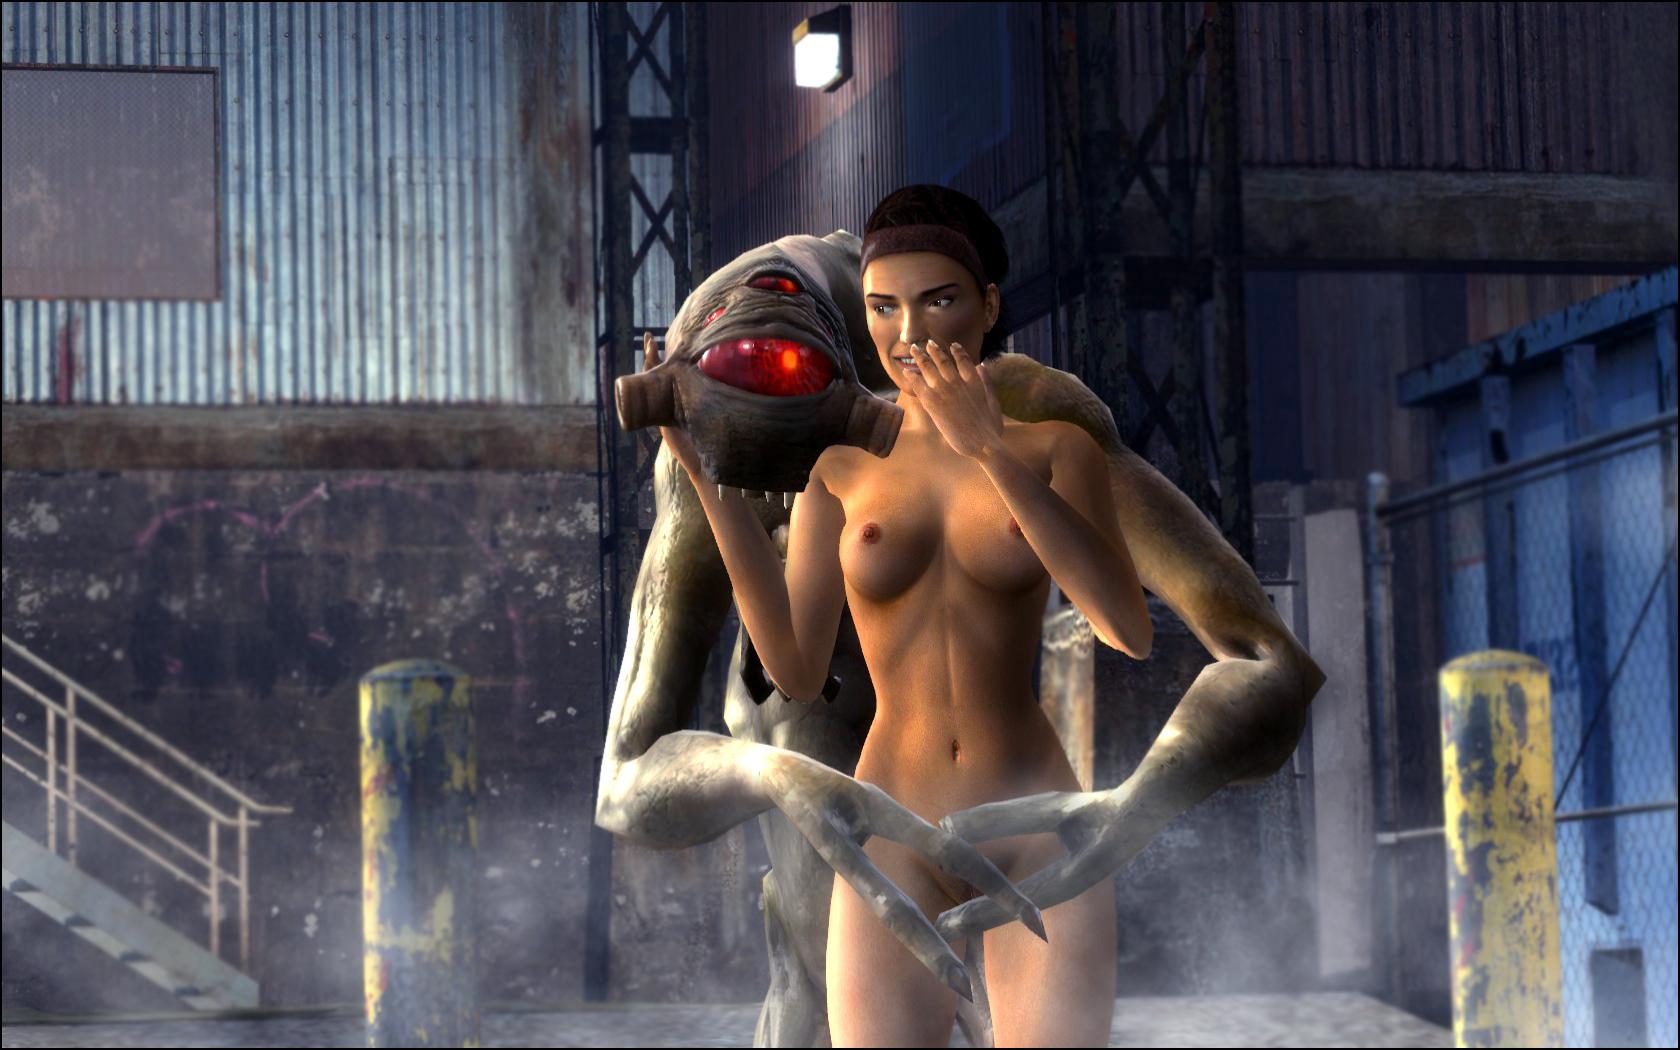 cinematic alyx half mod 2 life Ben 10 gwen porn pics